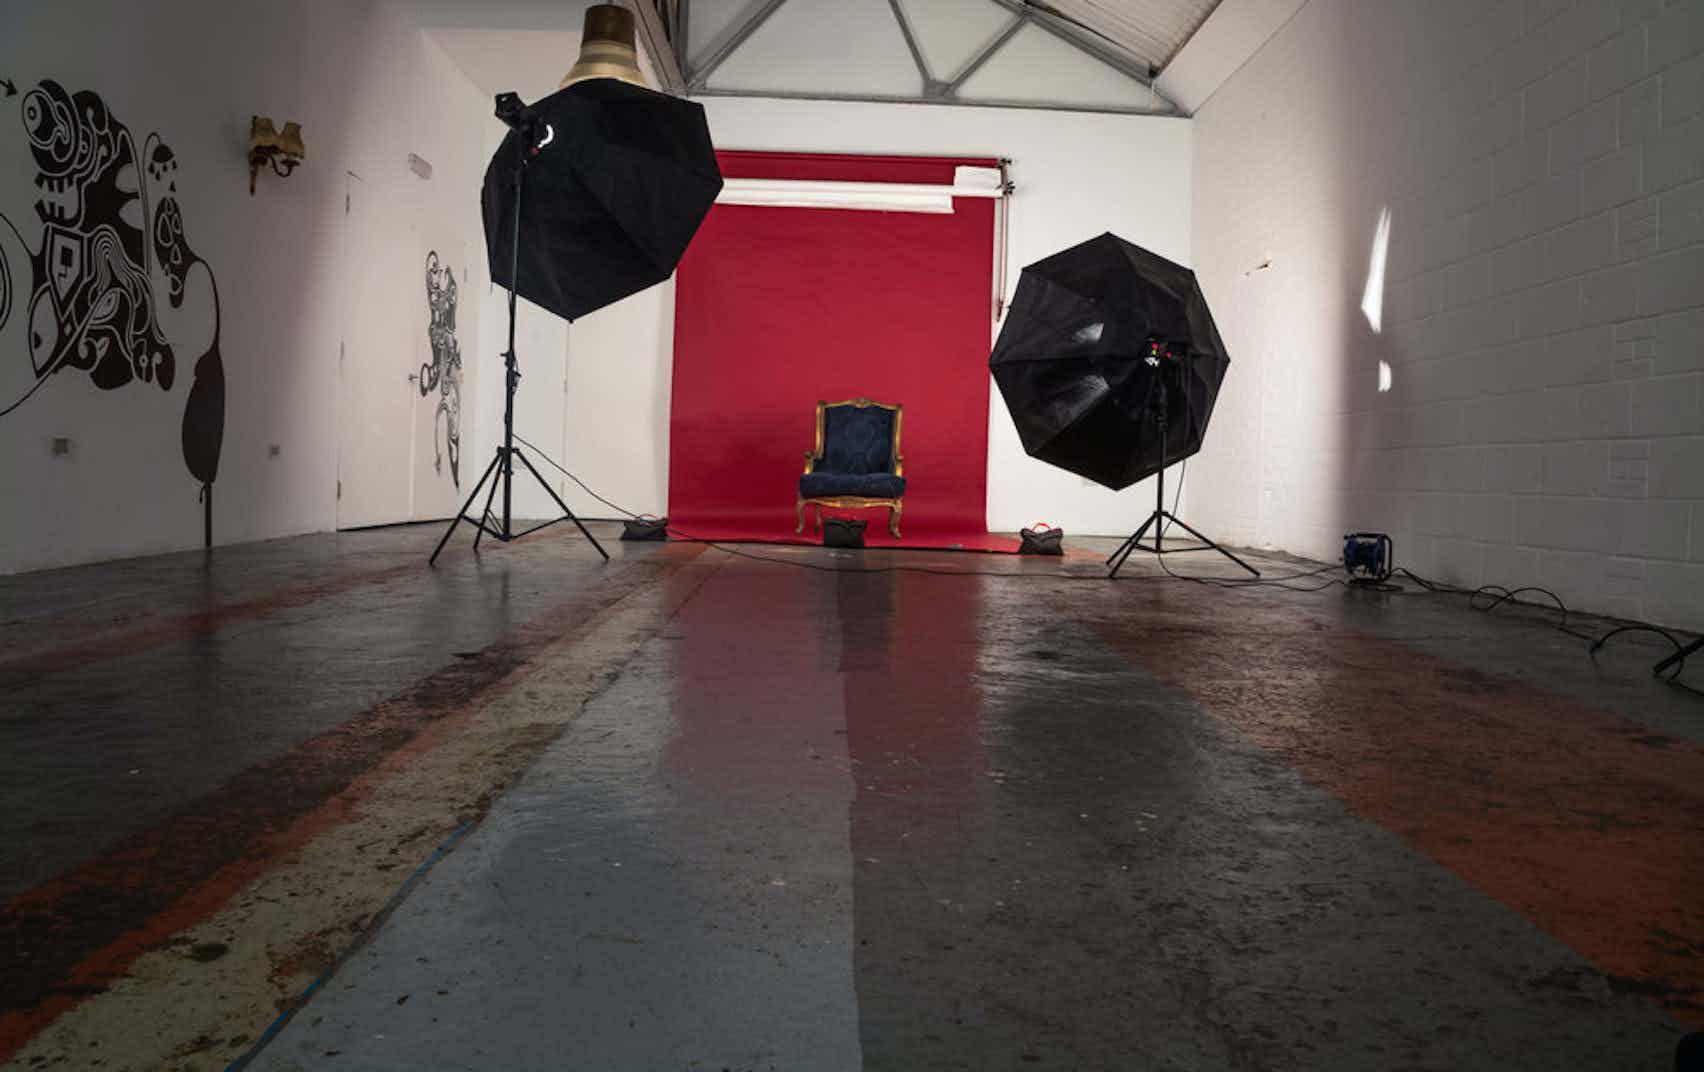 Studio 3, ChilliCheeze Studios